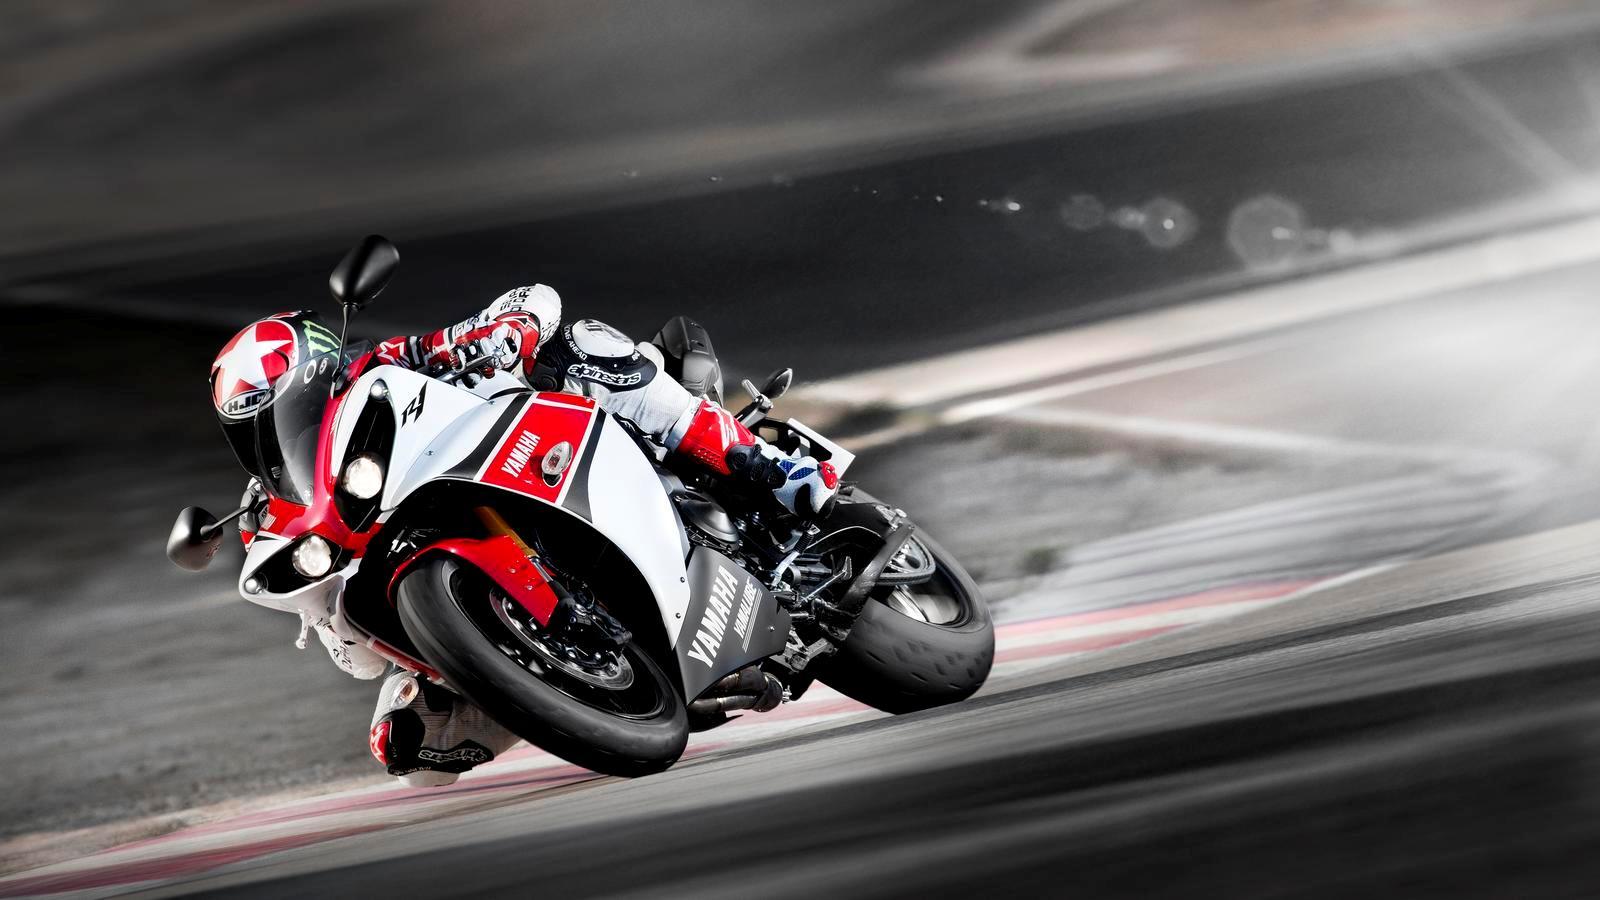 Тест-драйв мотоцикла Kawasaki ZX-10R